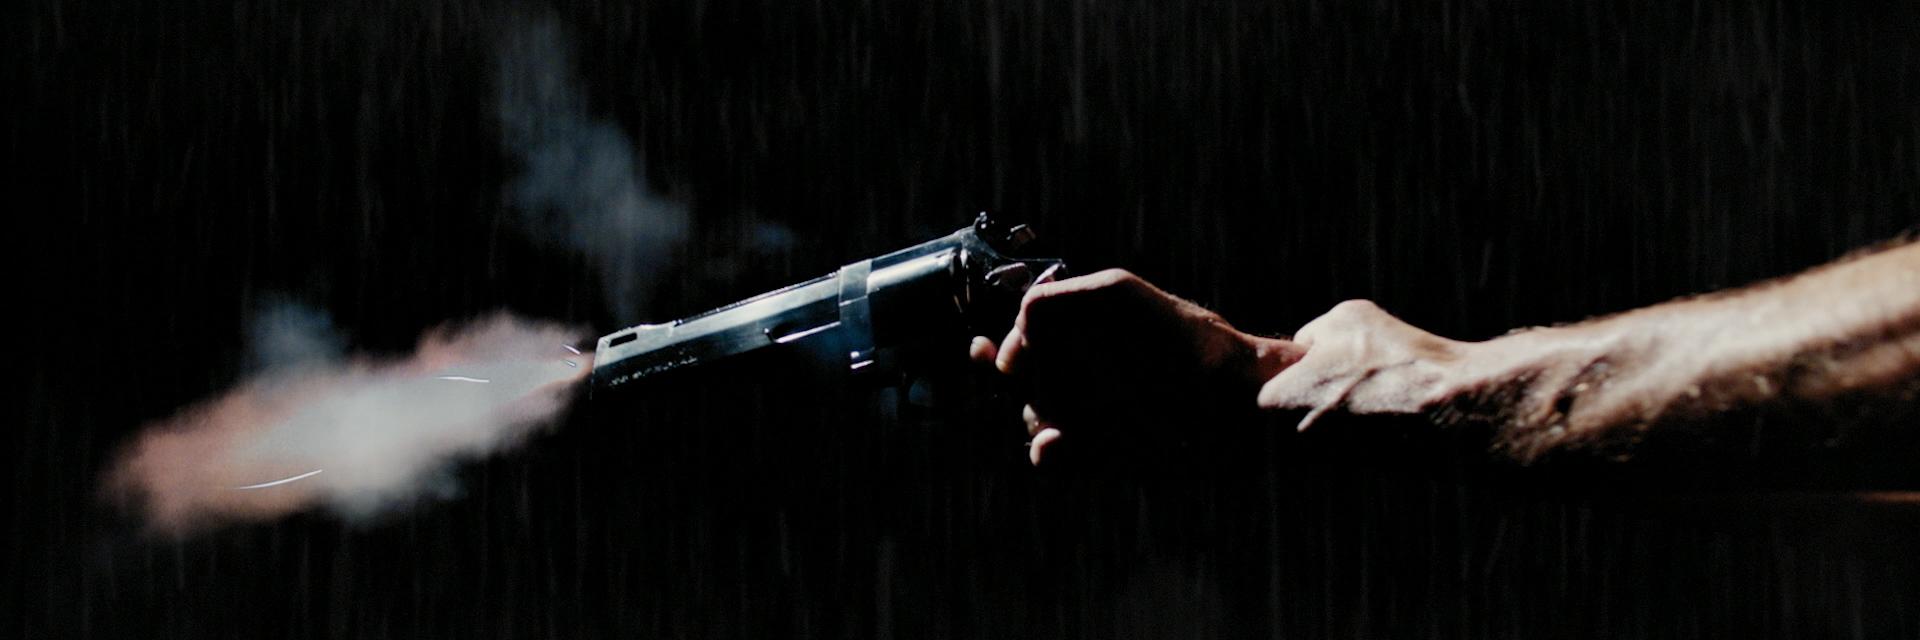 RINCON_CRIME_BARBARO_WEB_CBR.00_01_18_16.Still073.jpg